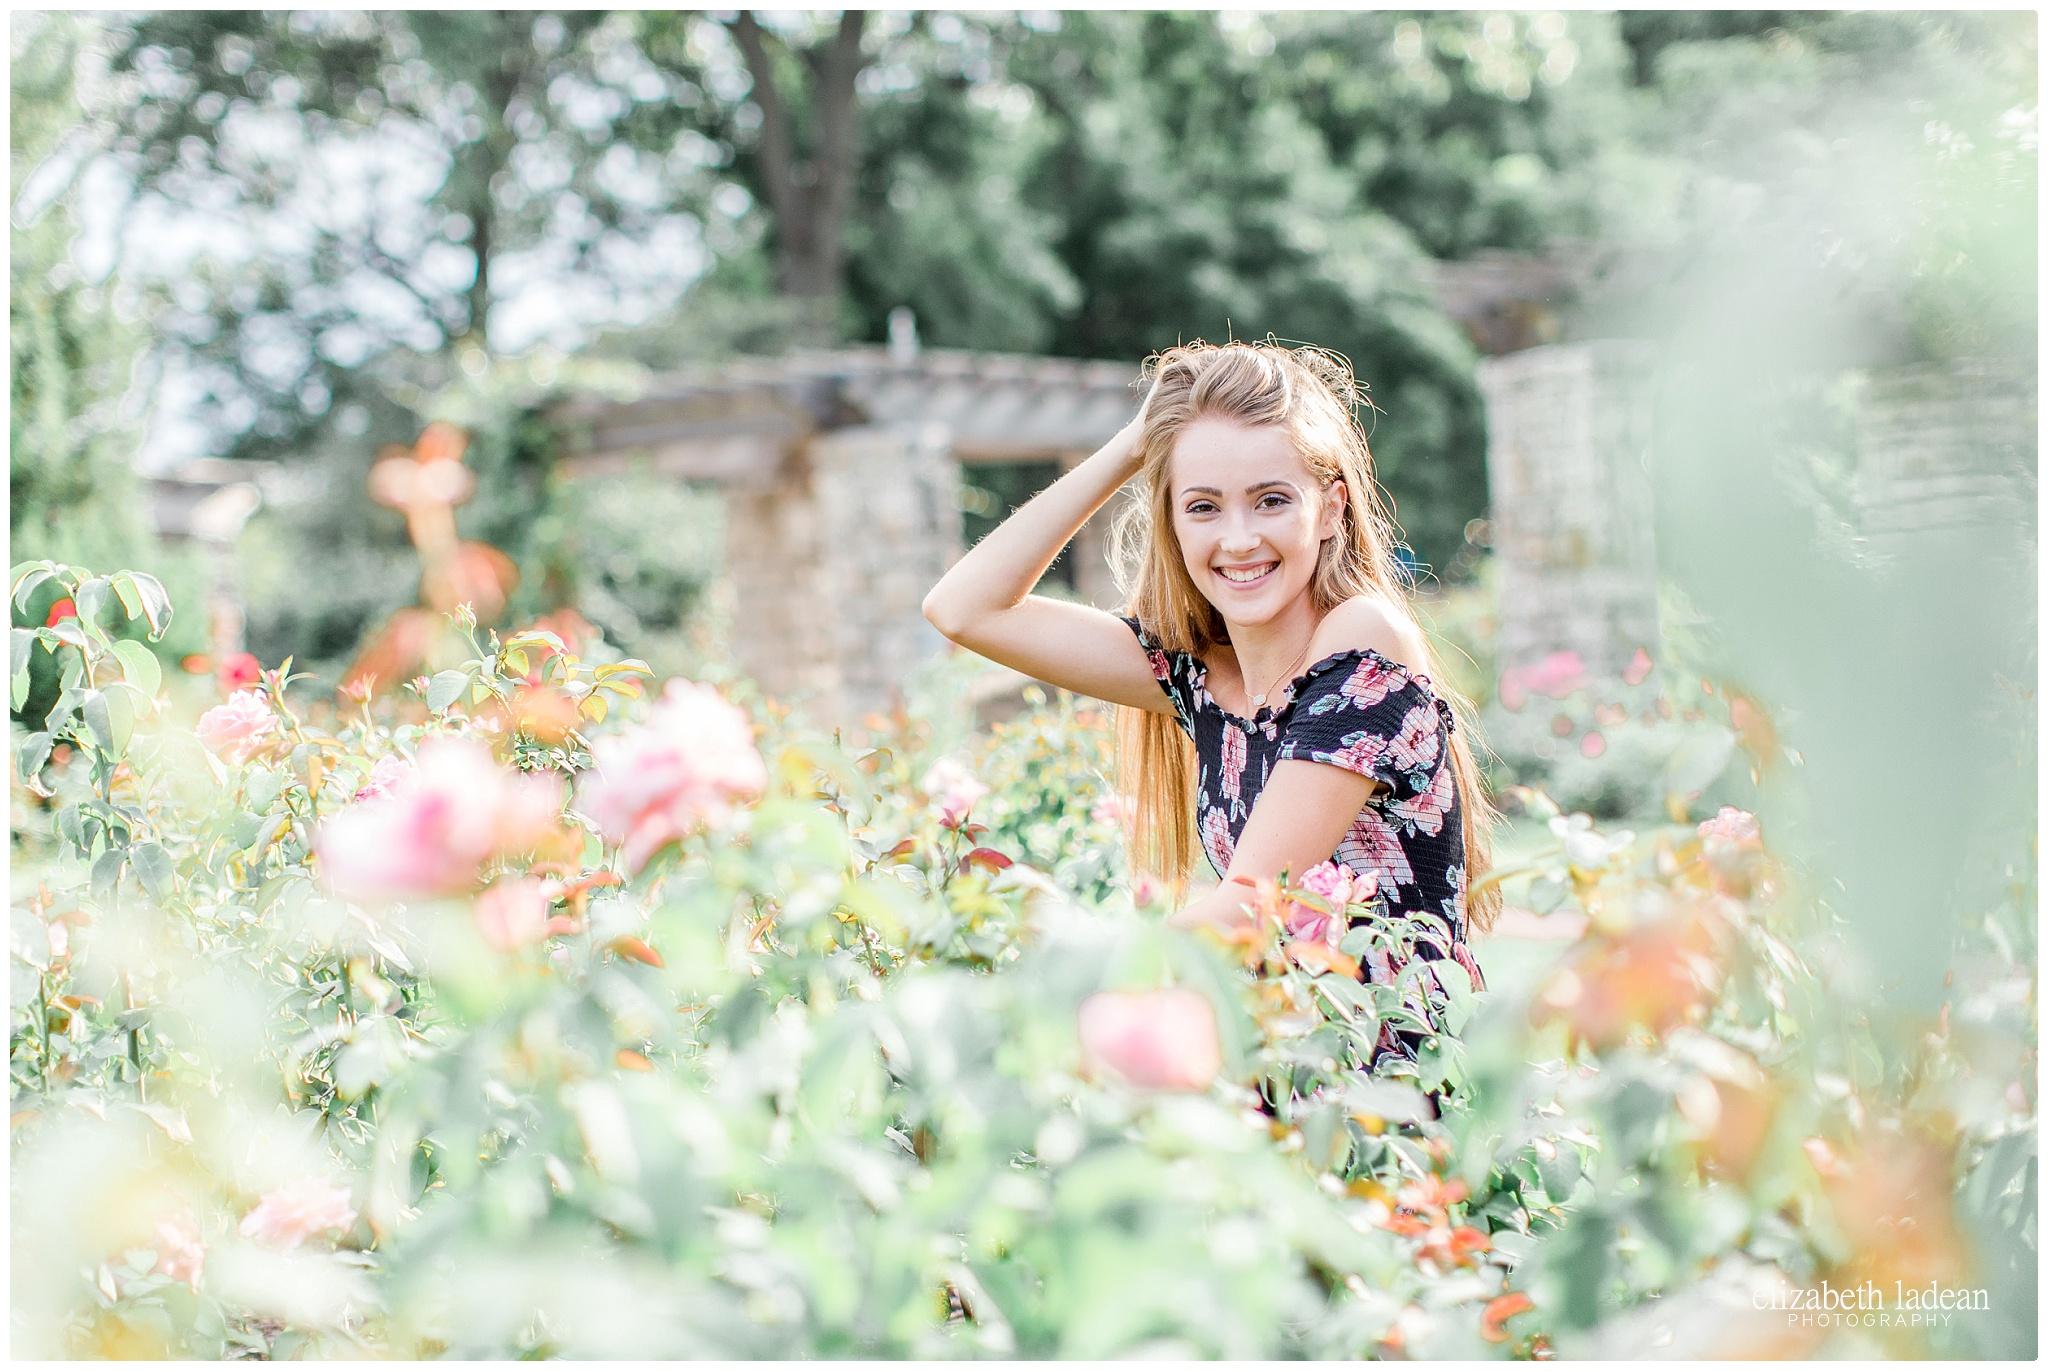 Kansas-City-High-School-Senior-Photography-Loose-Park-ER0817-Elizabeth-Ladean-Photography-photo_1943.jpg